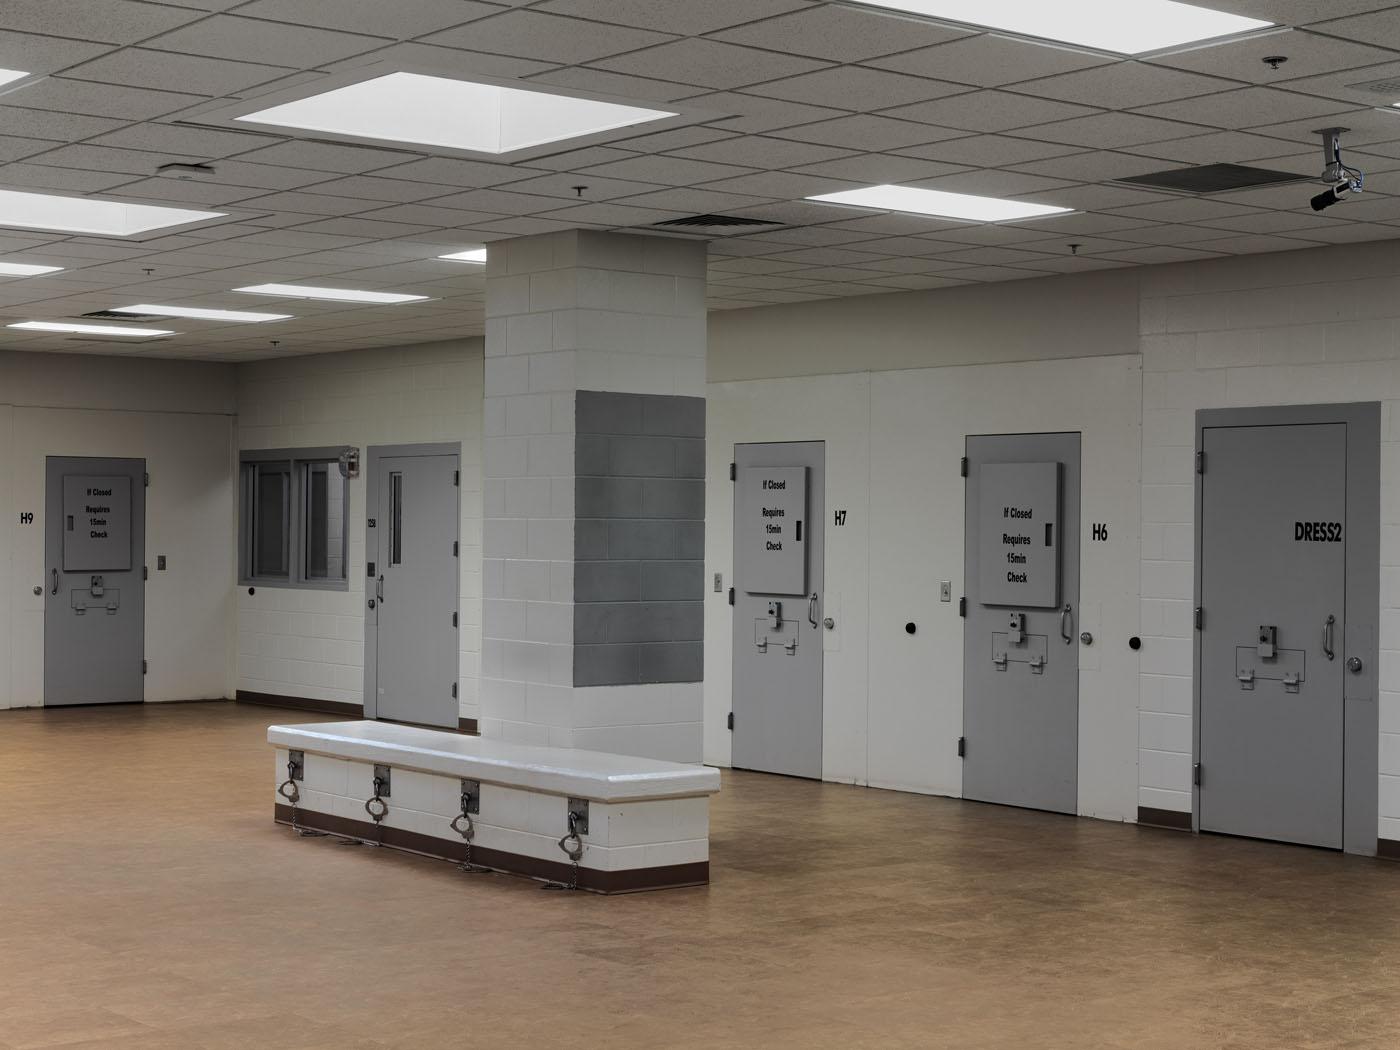 US prison, interior